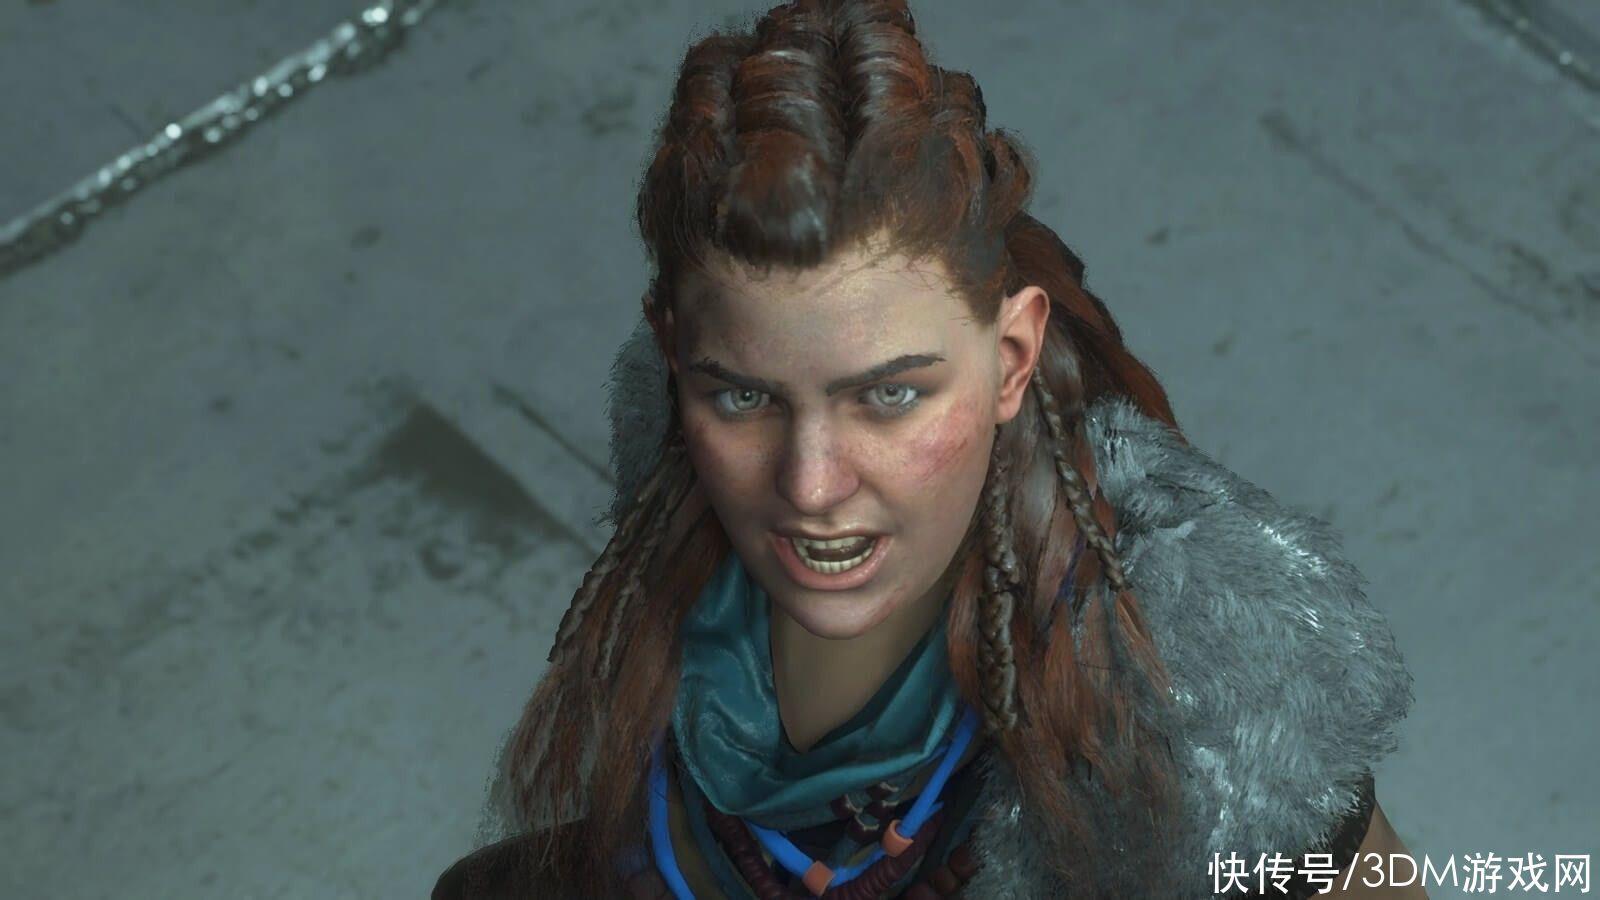 a8193 《生化危机3:重制版》新Mod 地平线女主角乱入